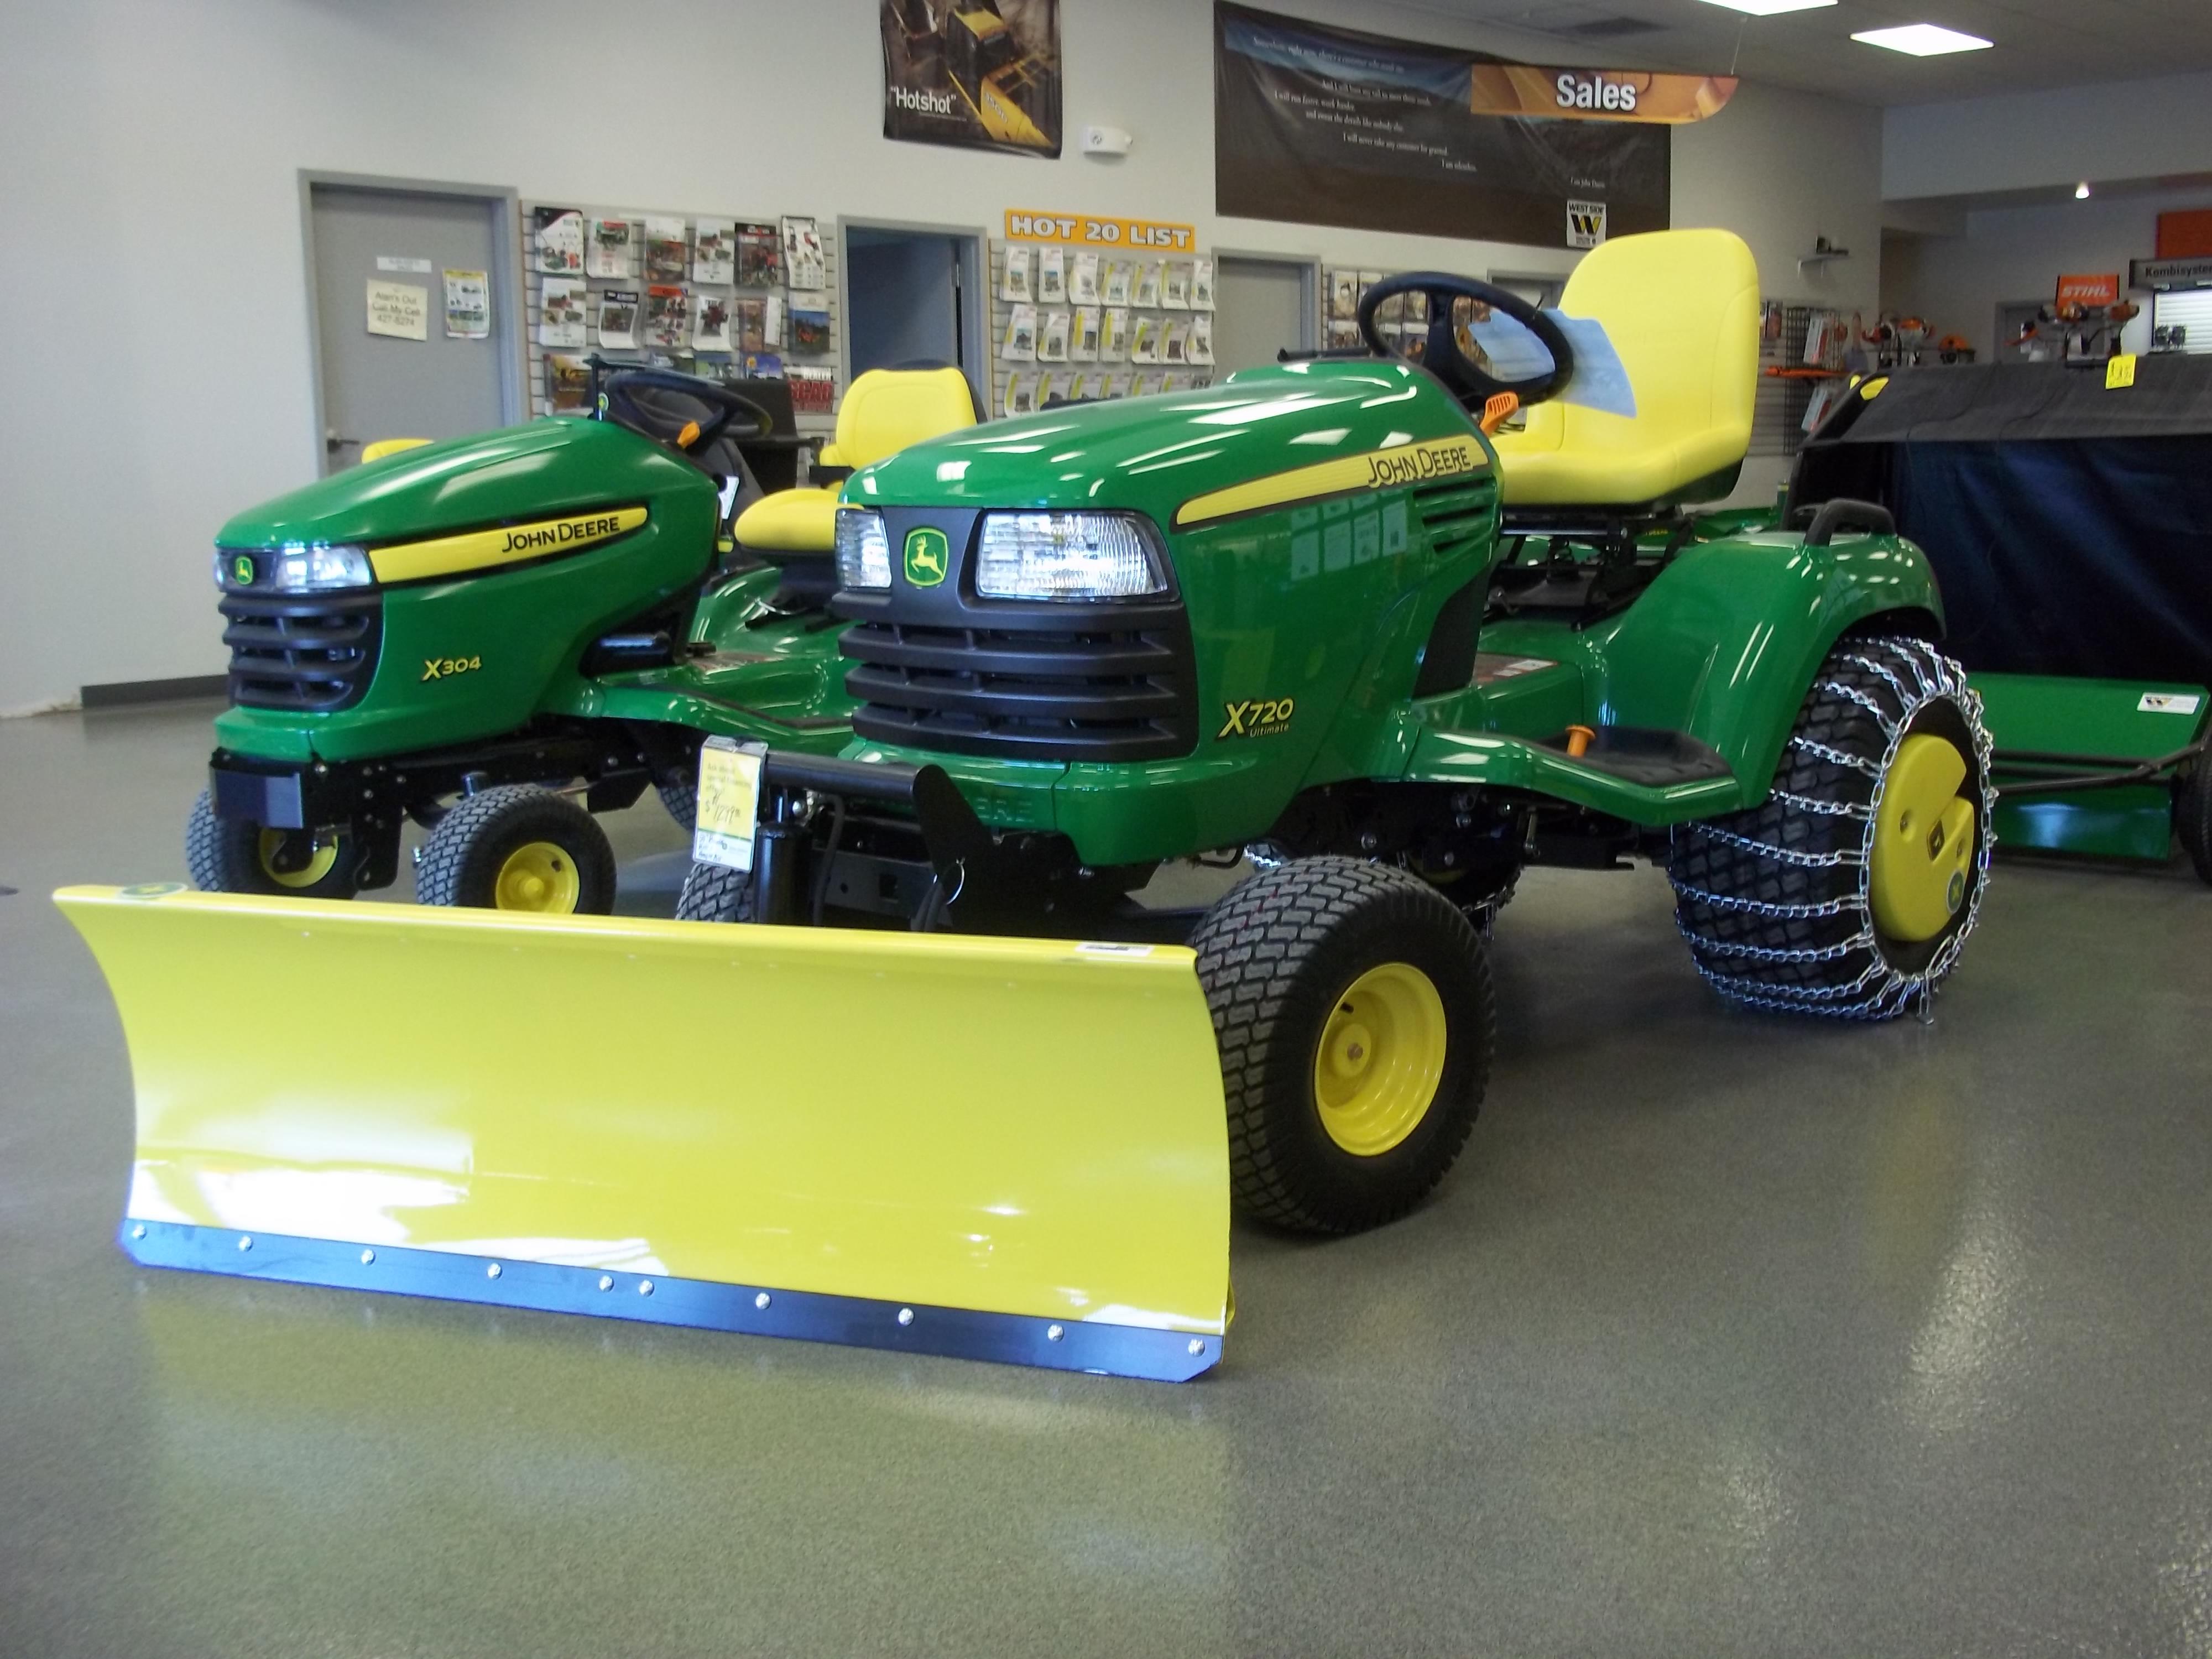 X700 Series tractor on right | John Deere equipment ...